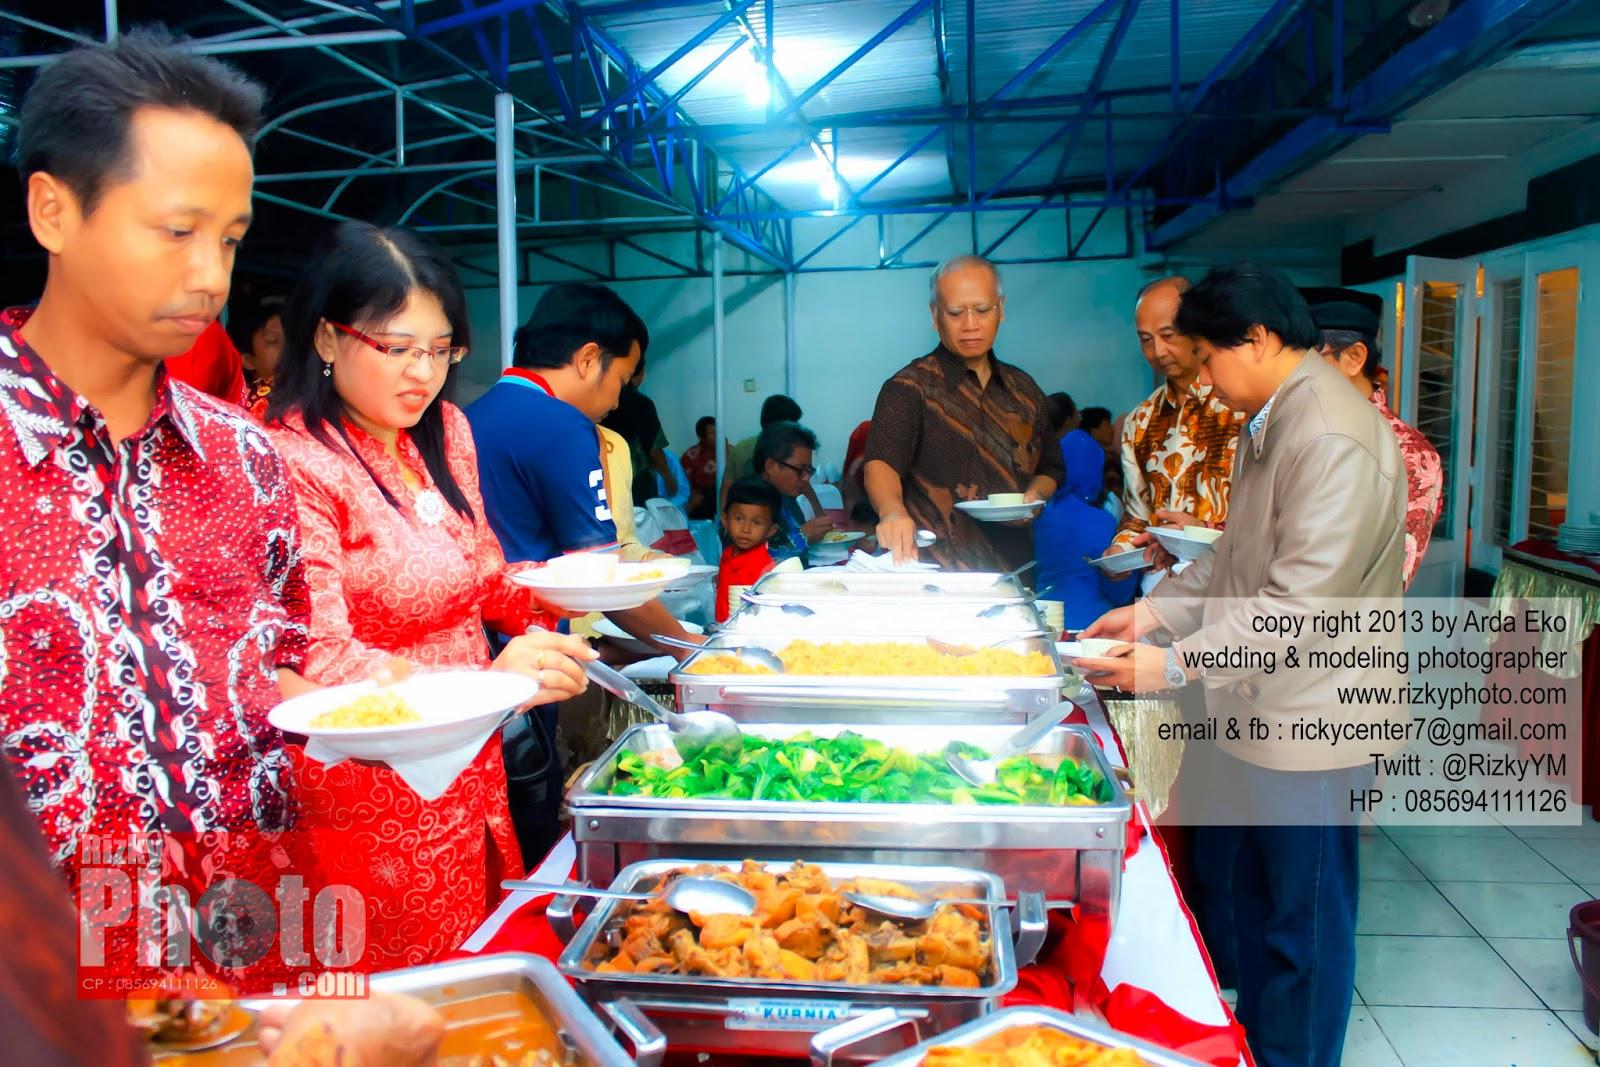 Lihat Fotografer Surabaya Prewedding Dokumentasi Wedding: Jasa Foto Wedding Surabaya